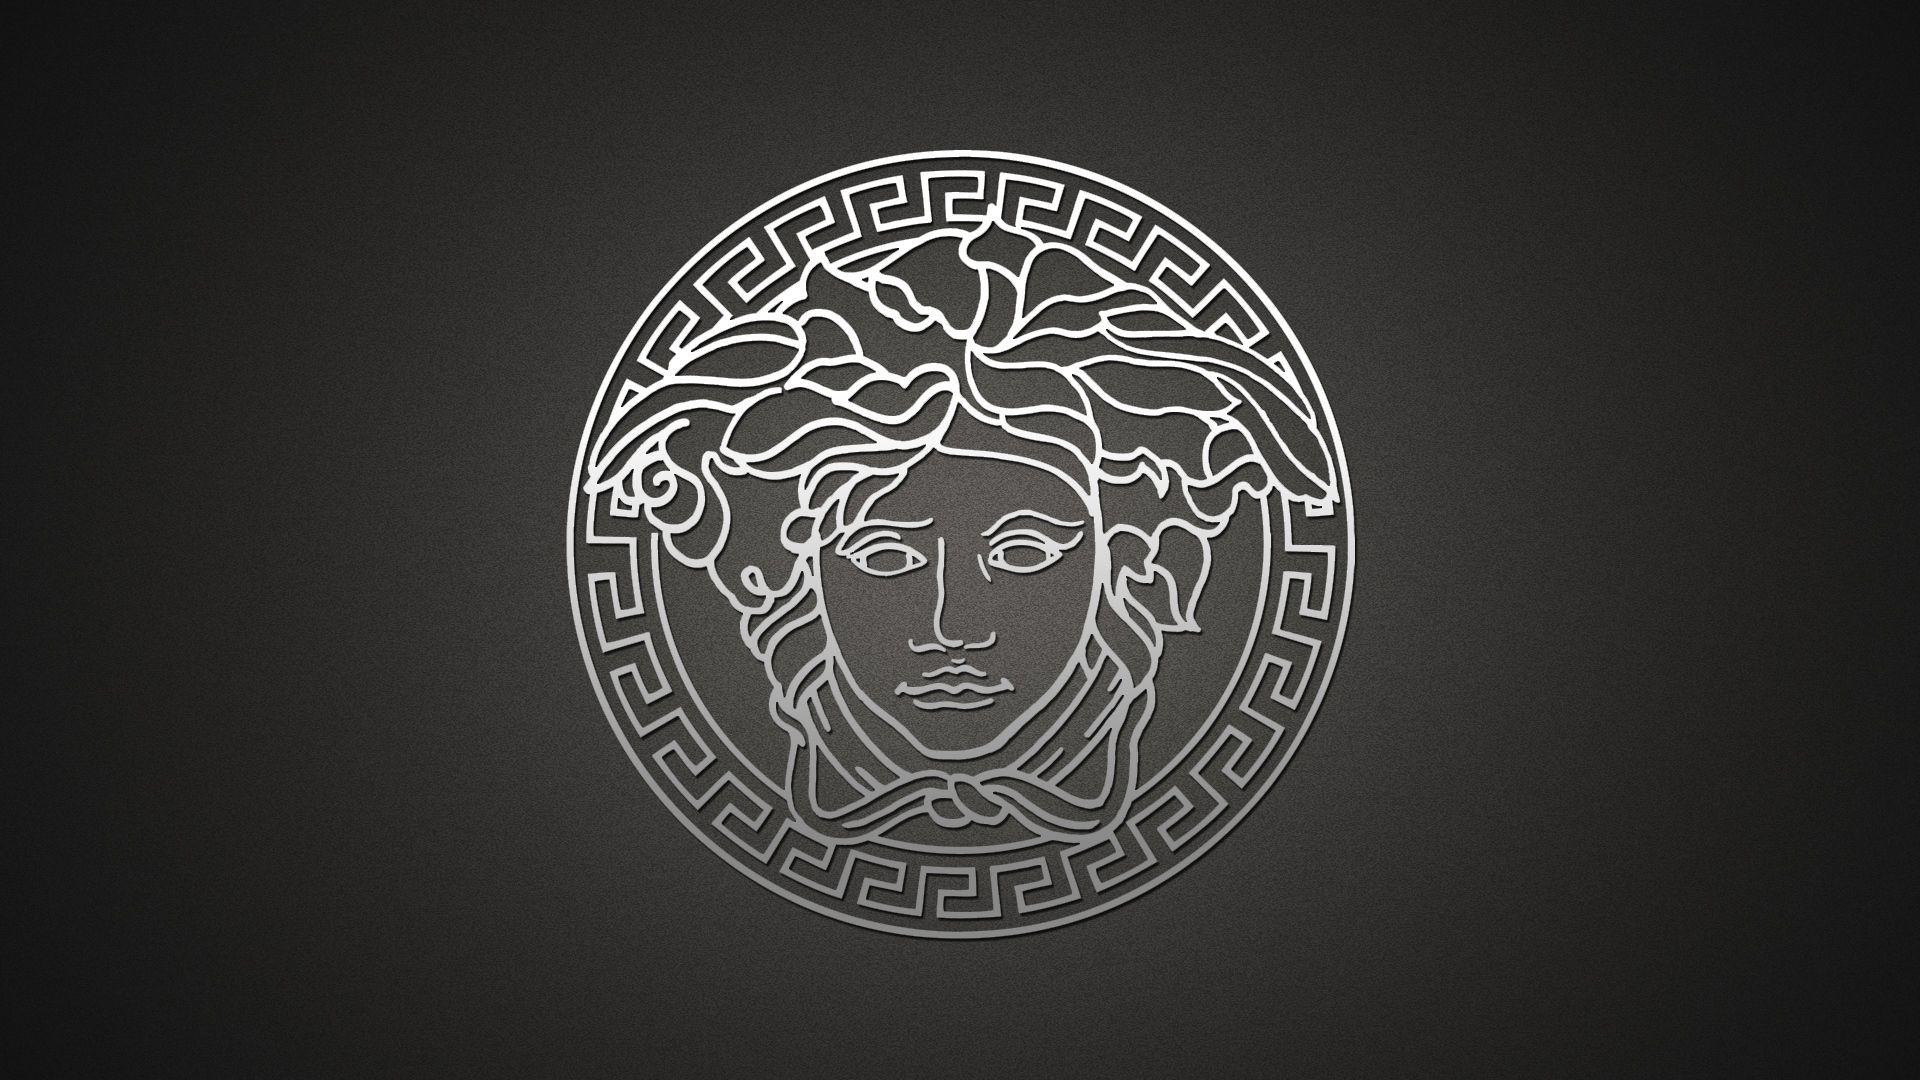 Versace Logo Brand Versace Wallpaper Iphone Wallpaper Travel Versace Logo